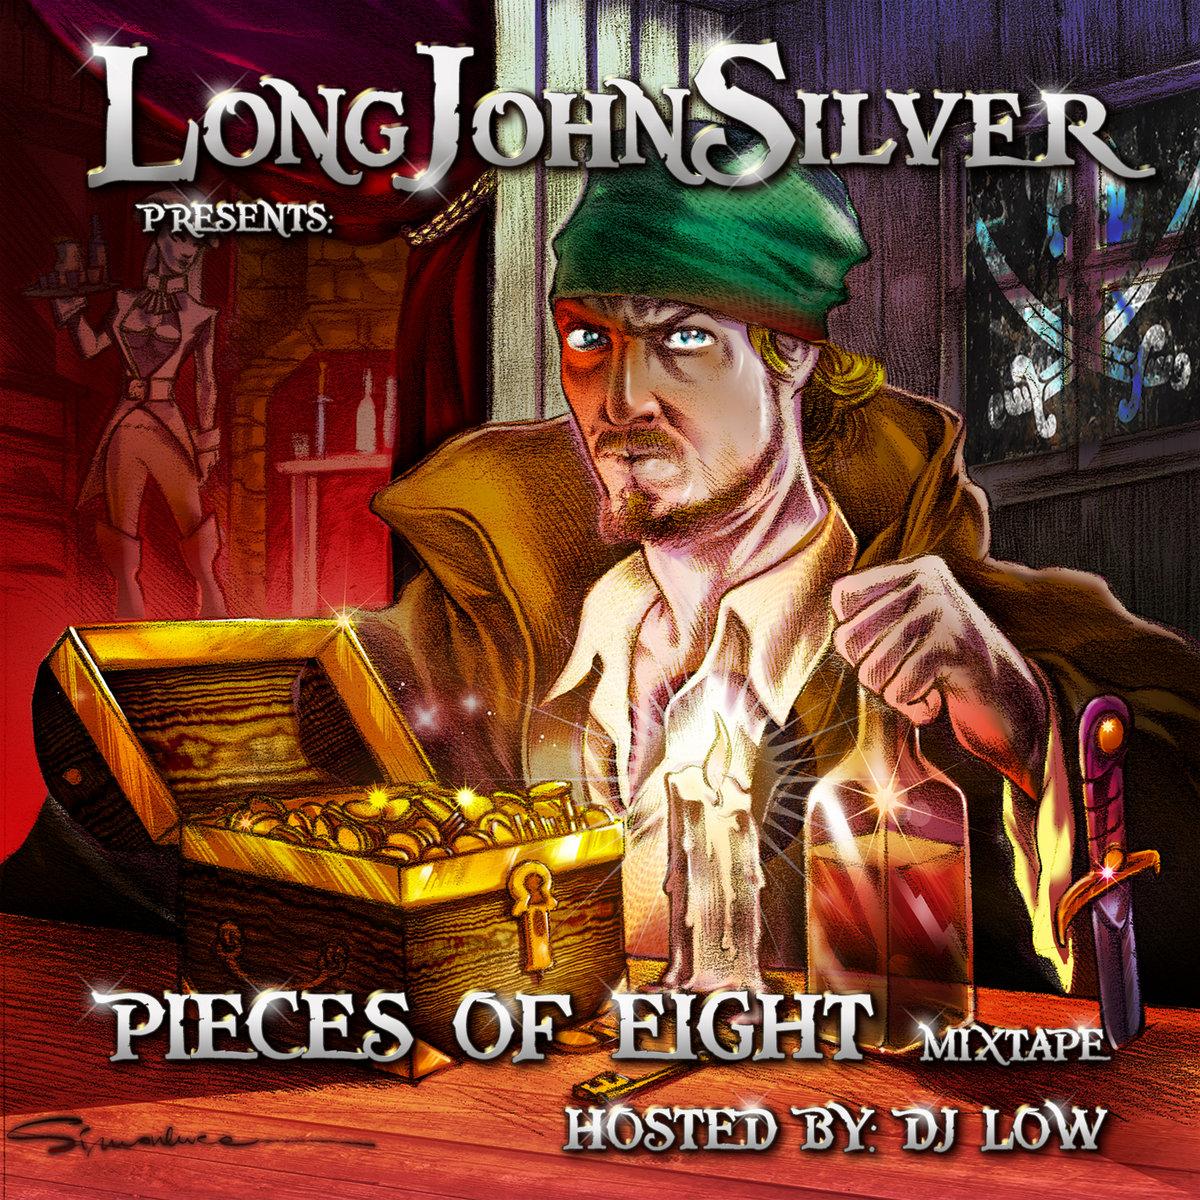 long john silver character description